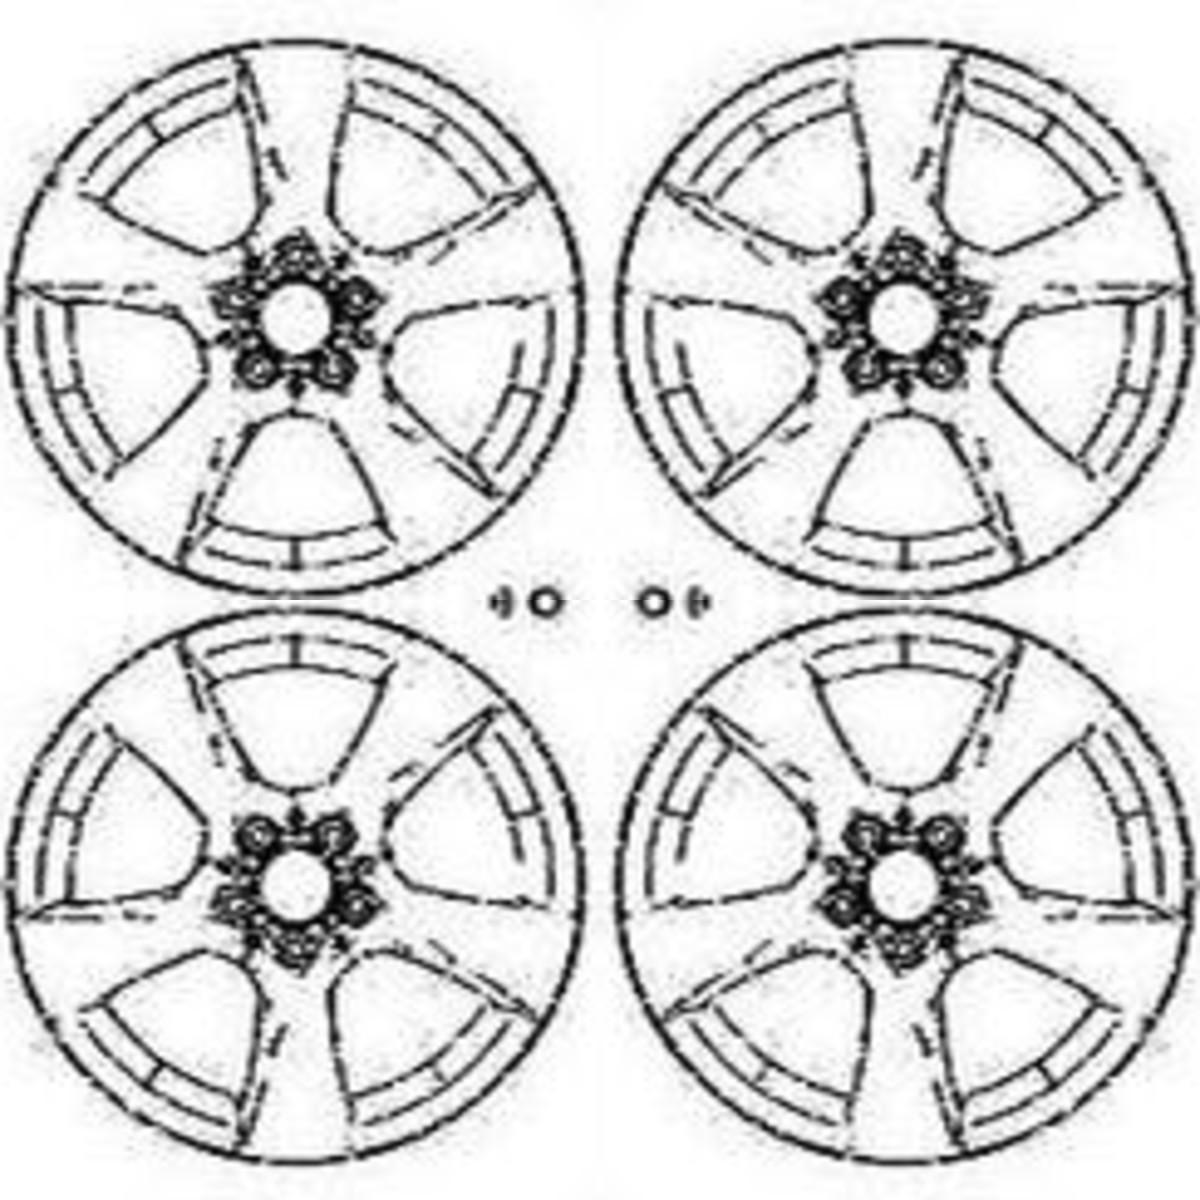 wheels america online store shop original oem remanufactured wheels 2007 Mercury Milan Premier original sets